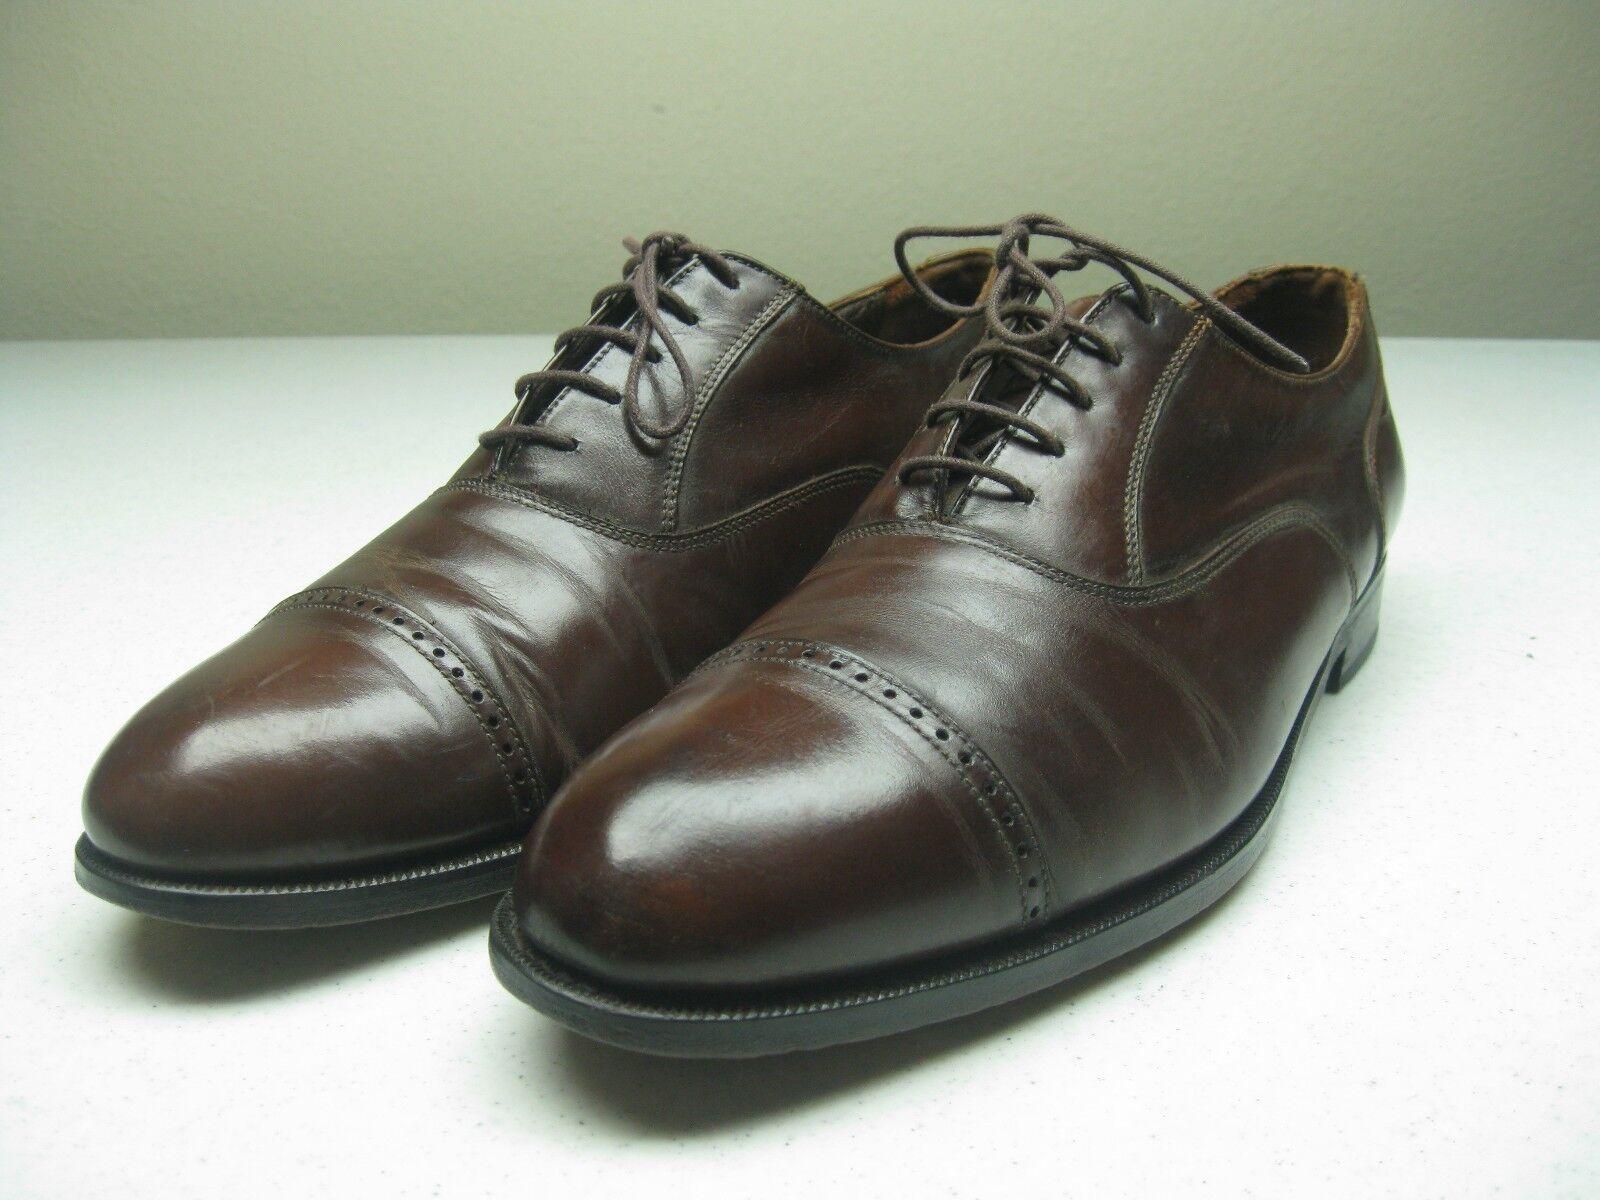 VINTAGE Marroneee CAP TOE OXFORD FLORSHIEM EXECUTIVE DRESS BUSINESS scarpe12D